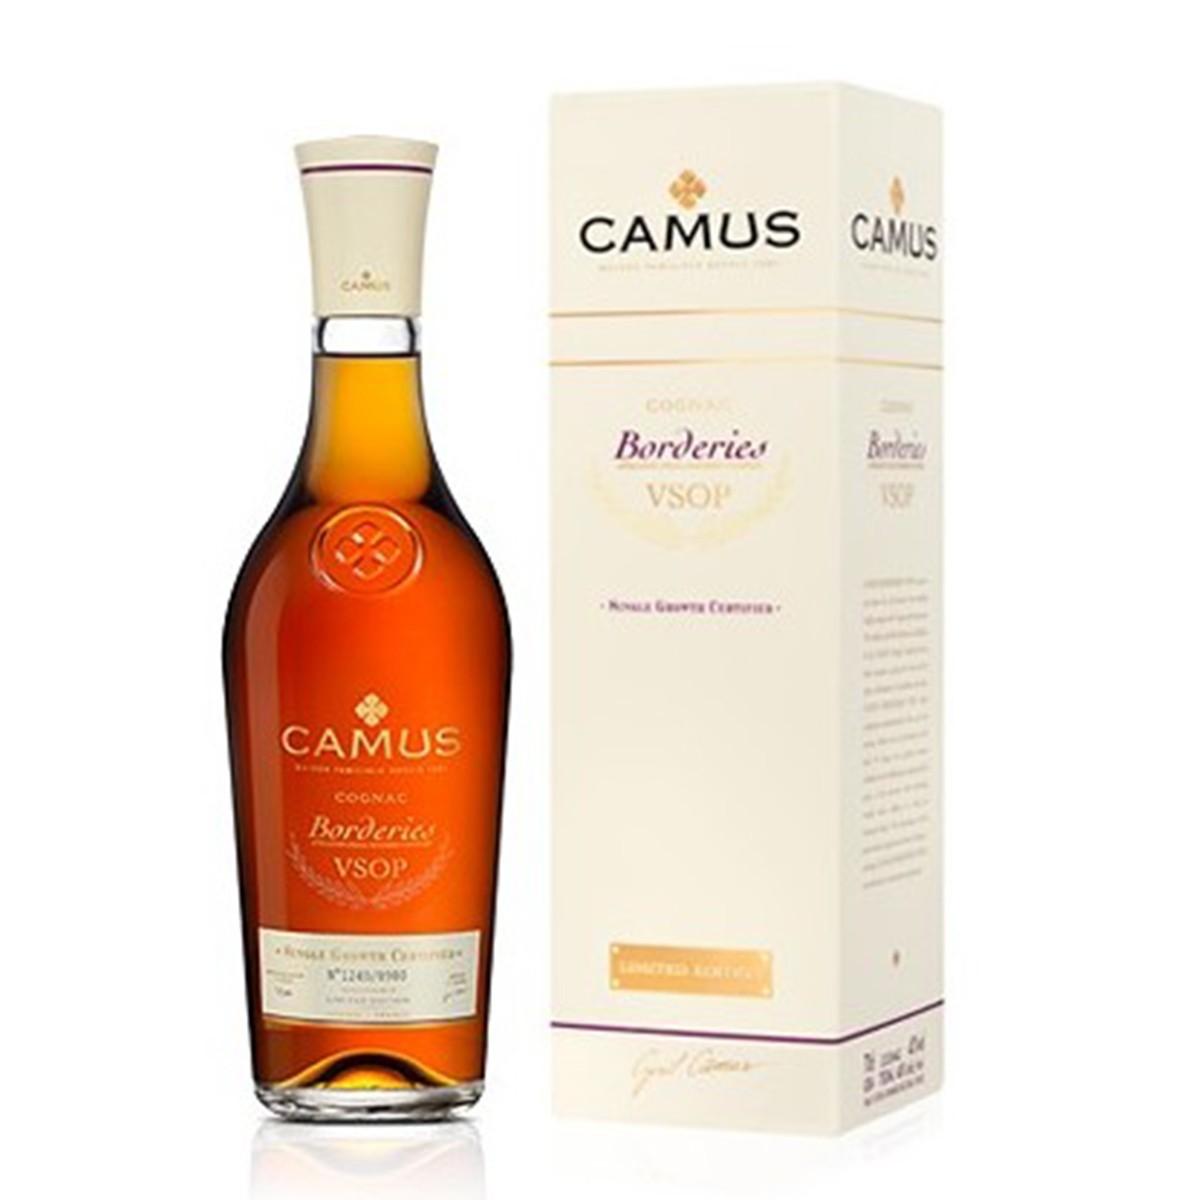 Camus VSOP Borderries 700 ml